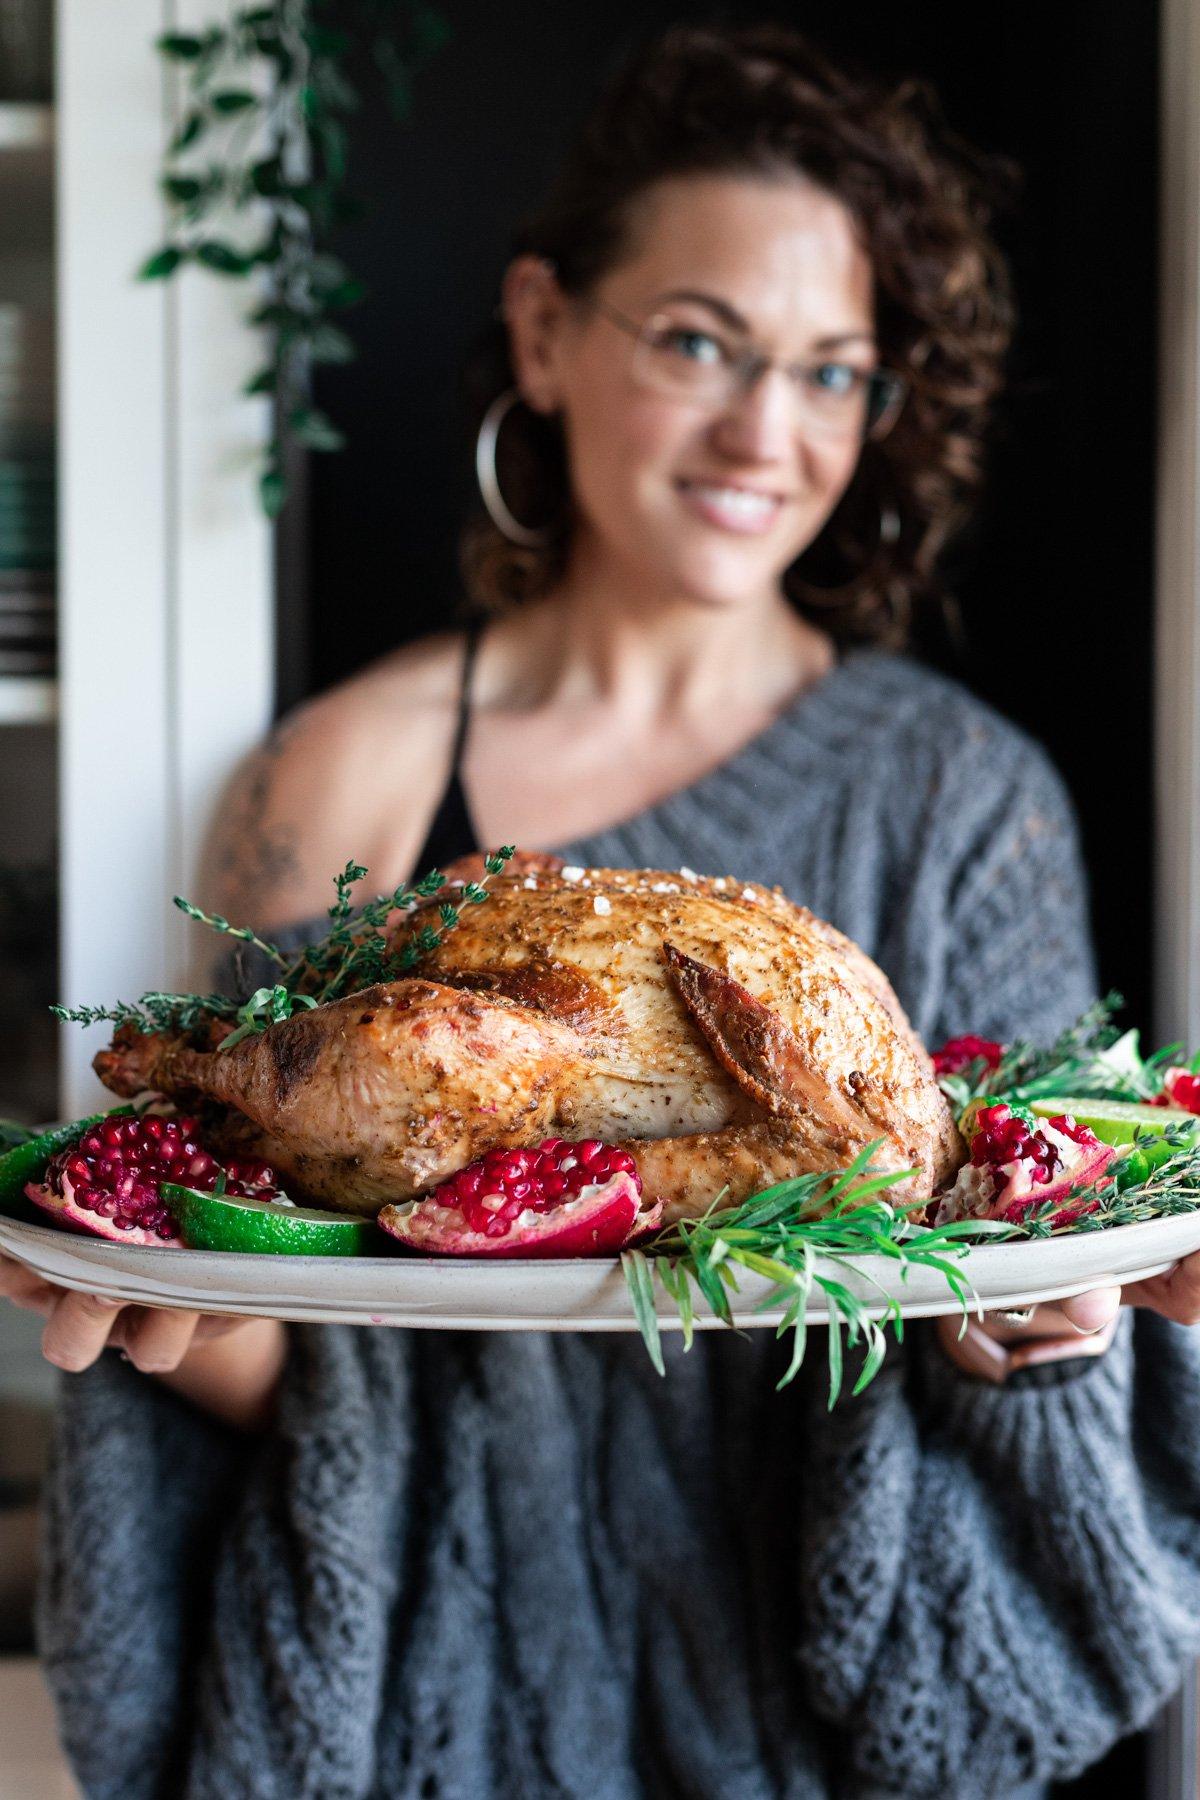 karly gomez holding za'atar dijon smoked turkey on a platter